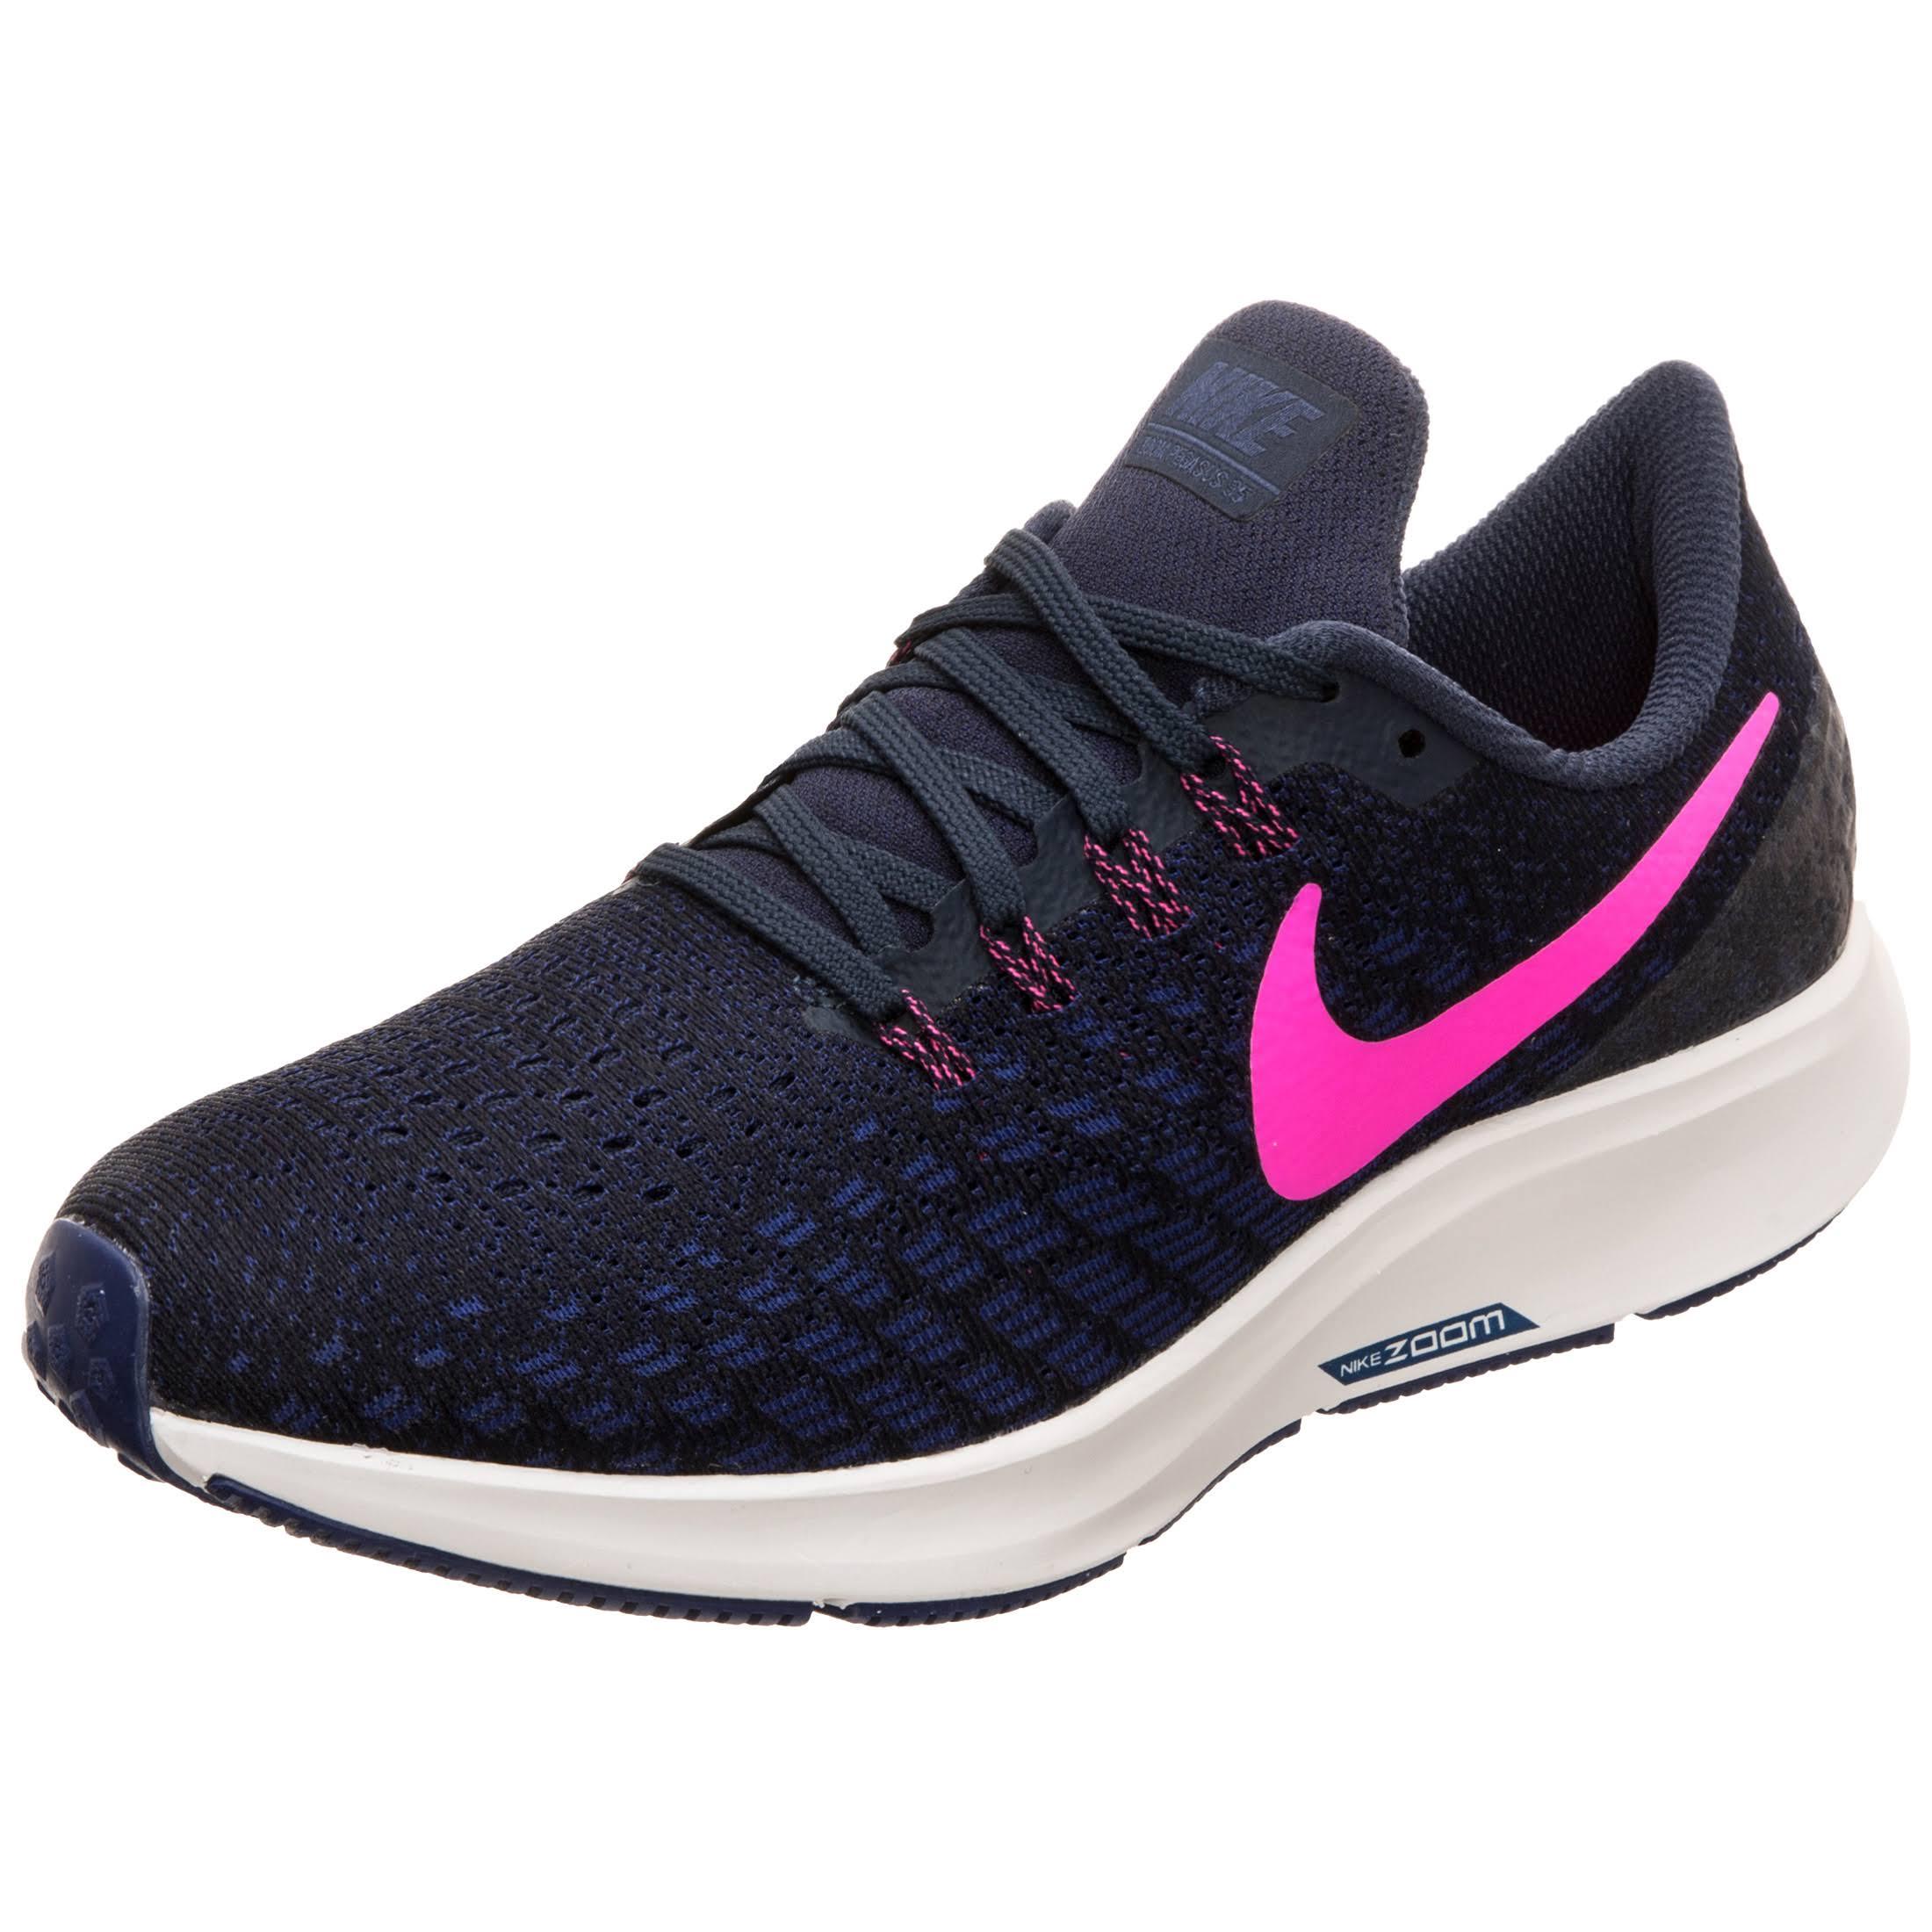 pink Zoom Pegasus Damen Air Blau Für 35 Dunkelgrau Laufschuhe Nike TzwqE5x